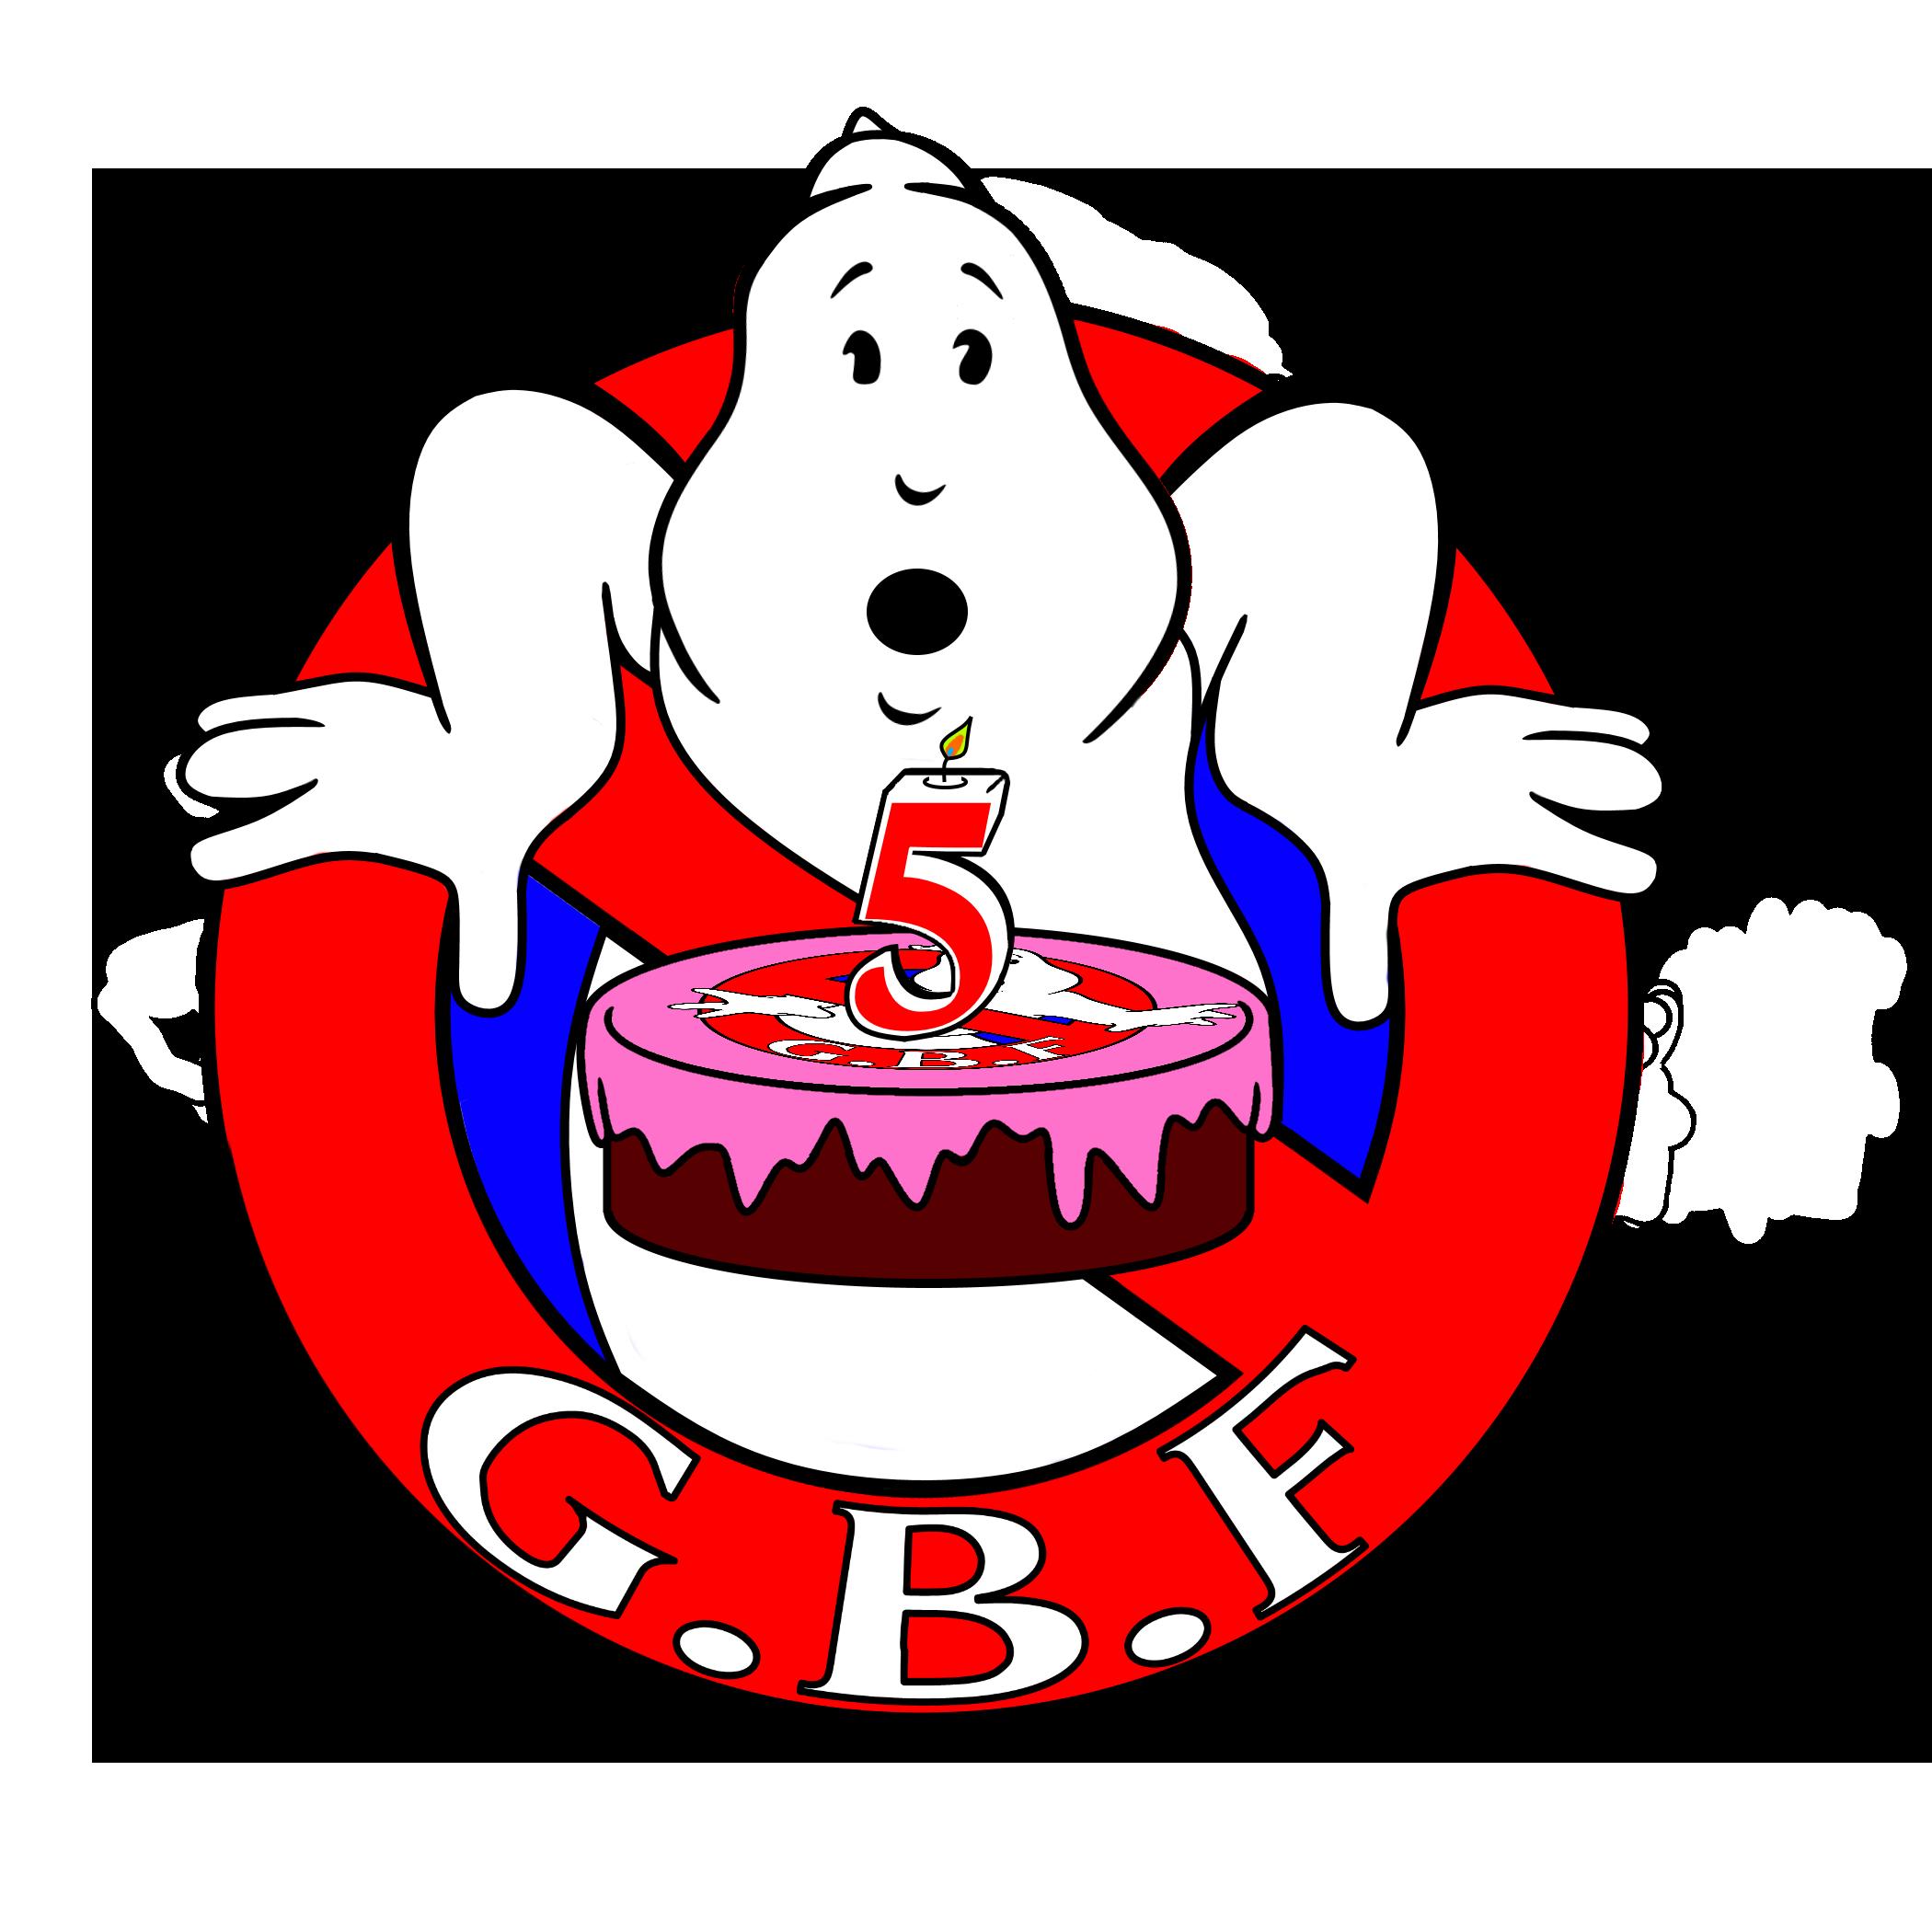 Les 5 ans de Ghostbusters France ! - Ghostbusters France